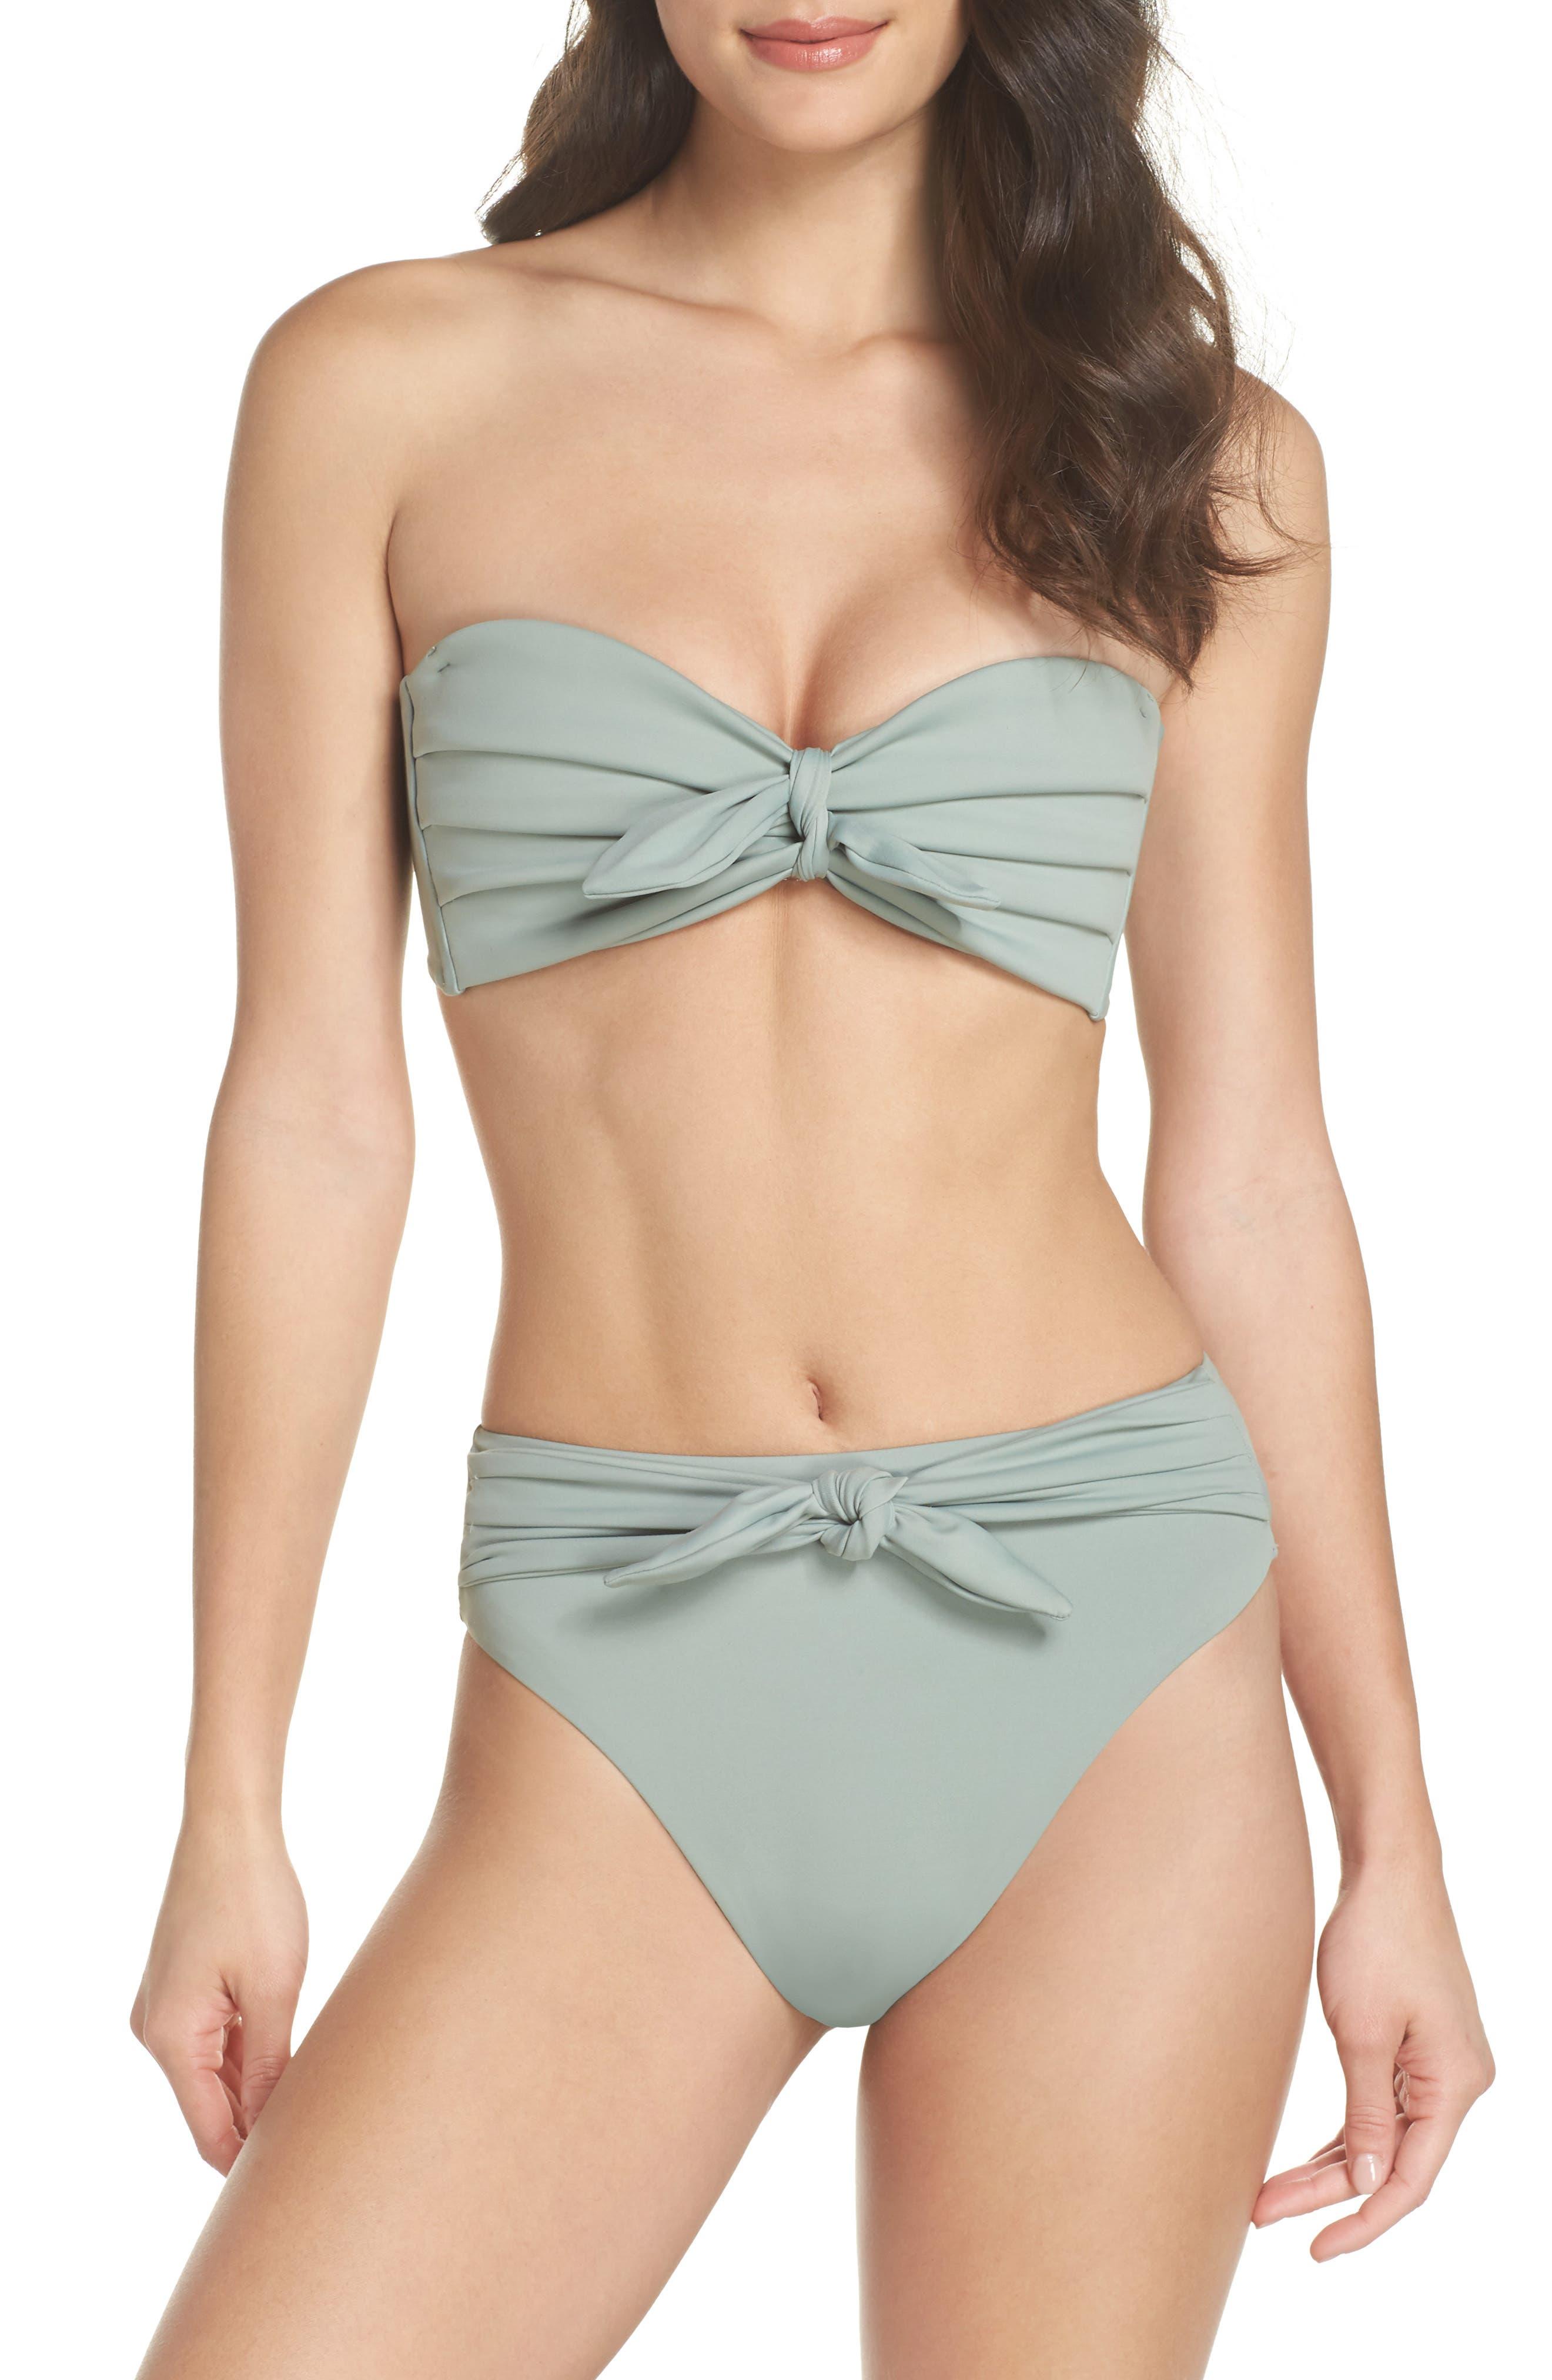 Cabana Bikini Top,                             Alternate thumbnail 8, color,                             PISTACHE GREEN